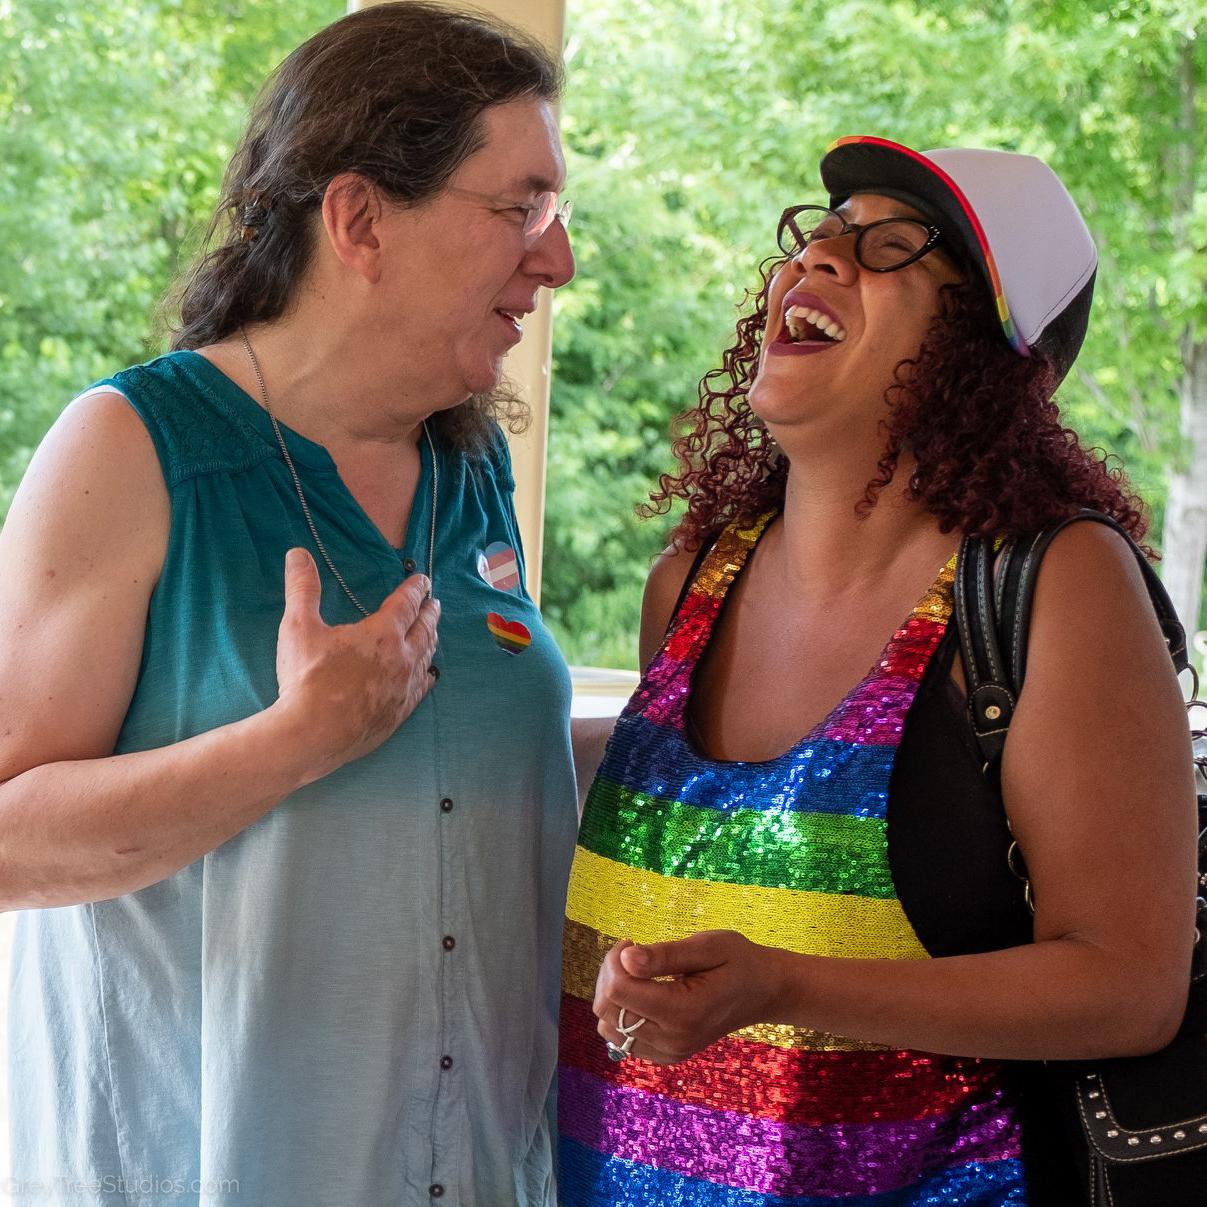 LGBTQ people laughing